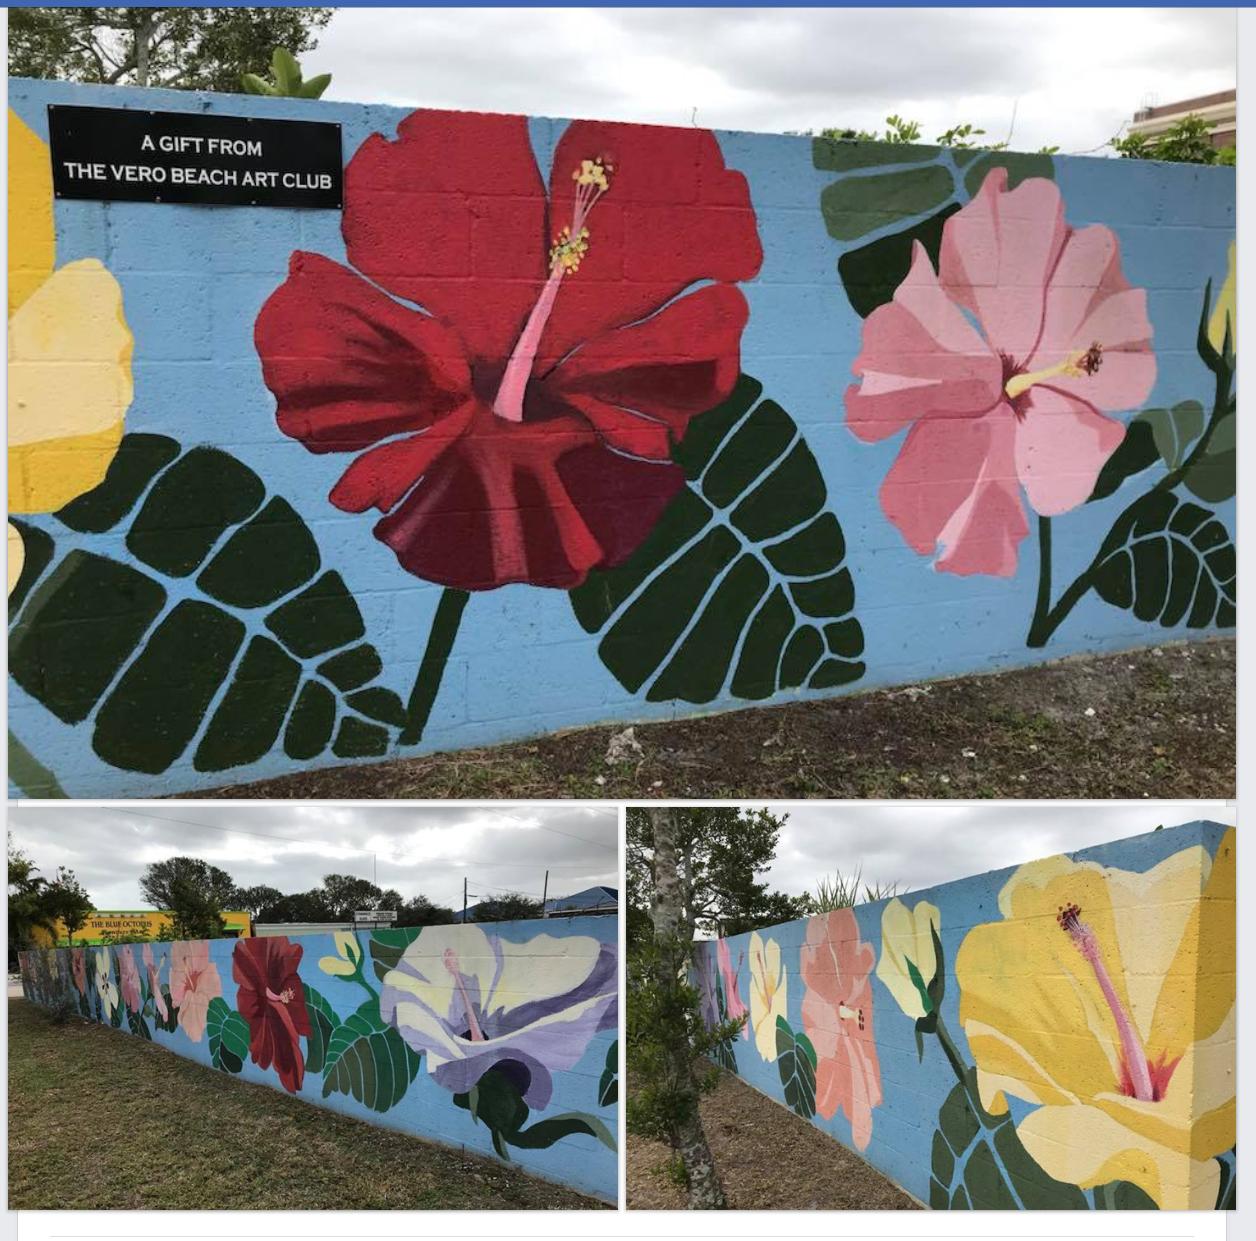 Wall after restoration by Art Club member and artist Carol Makris.